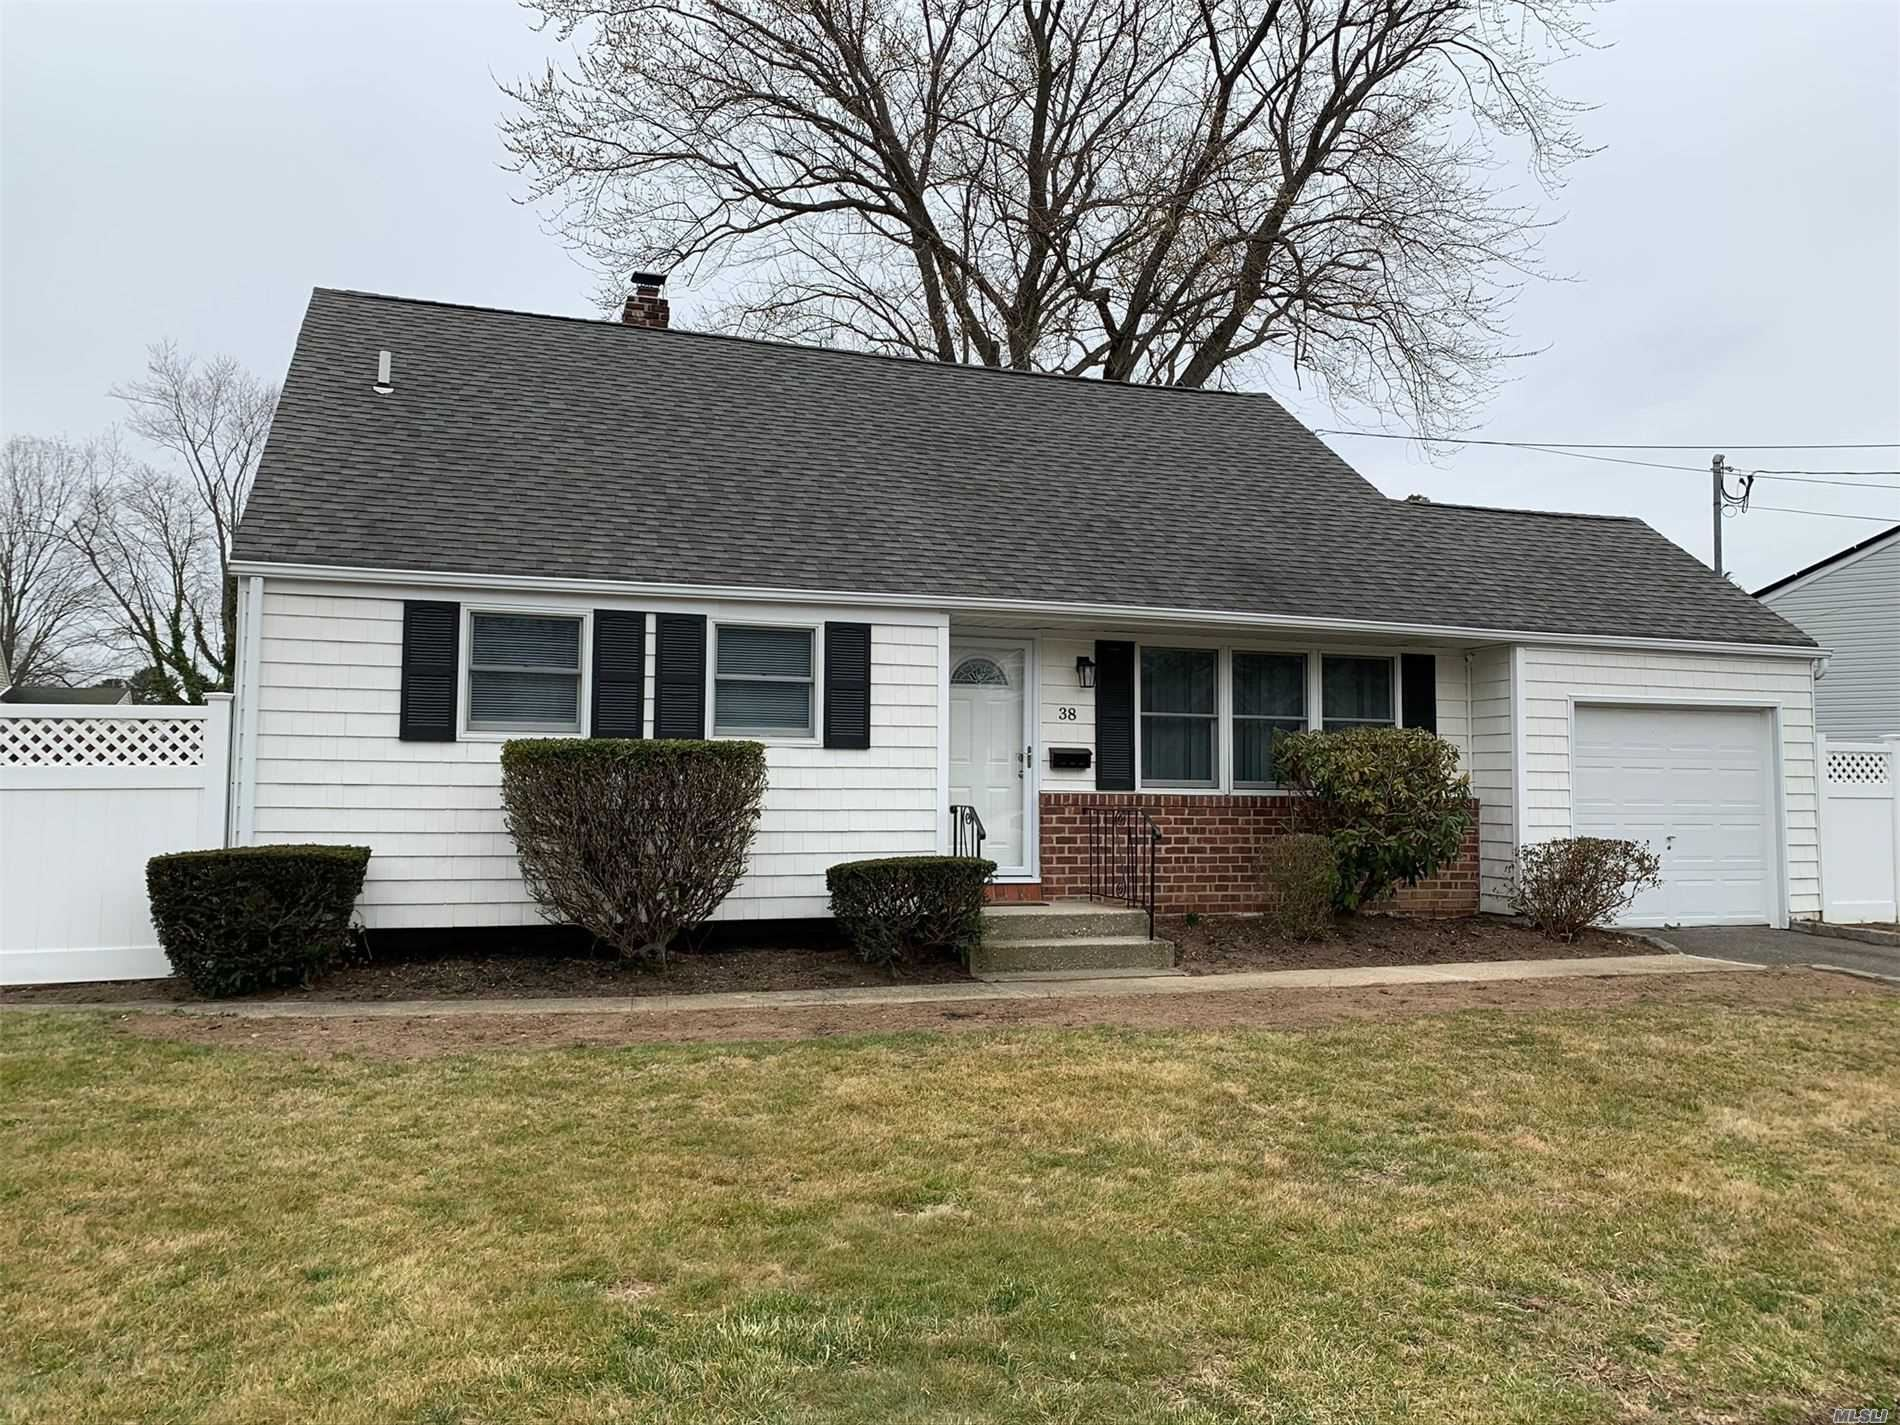 38 Birchbrook Drive, Smithtown, NY 11787 - MLS#: 3203097